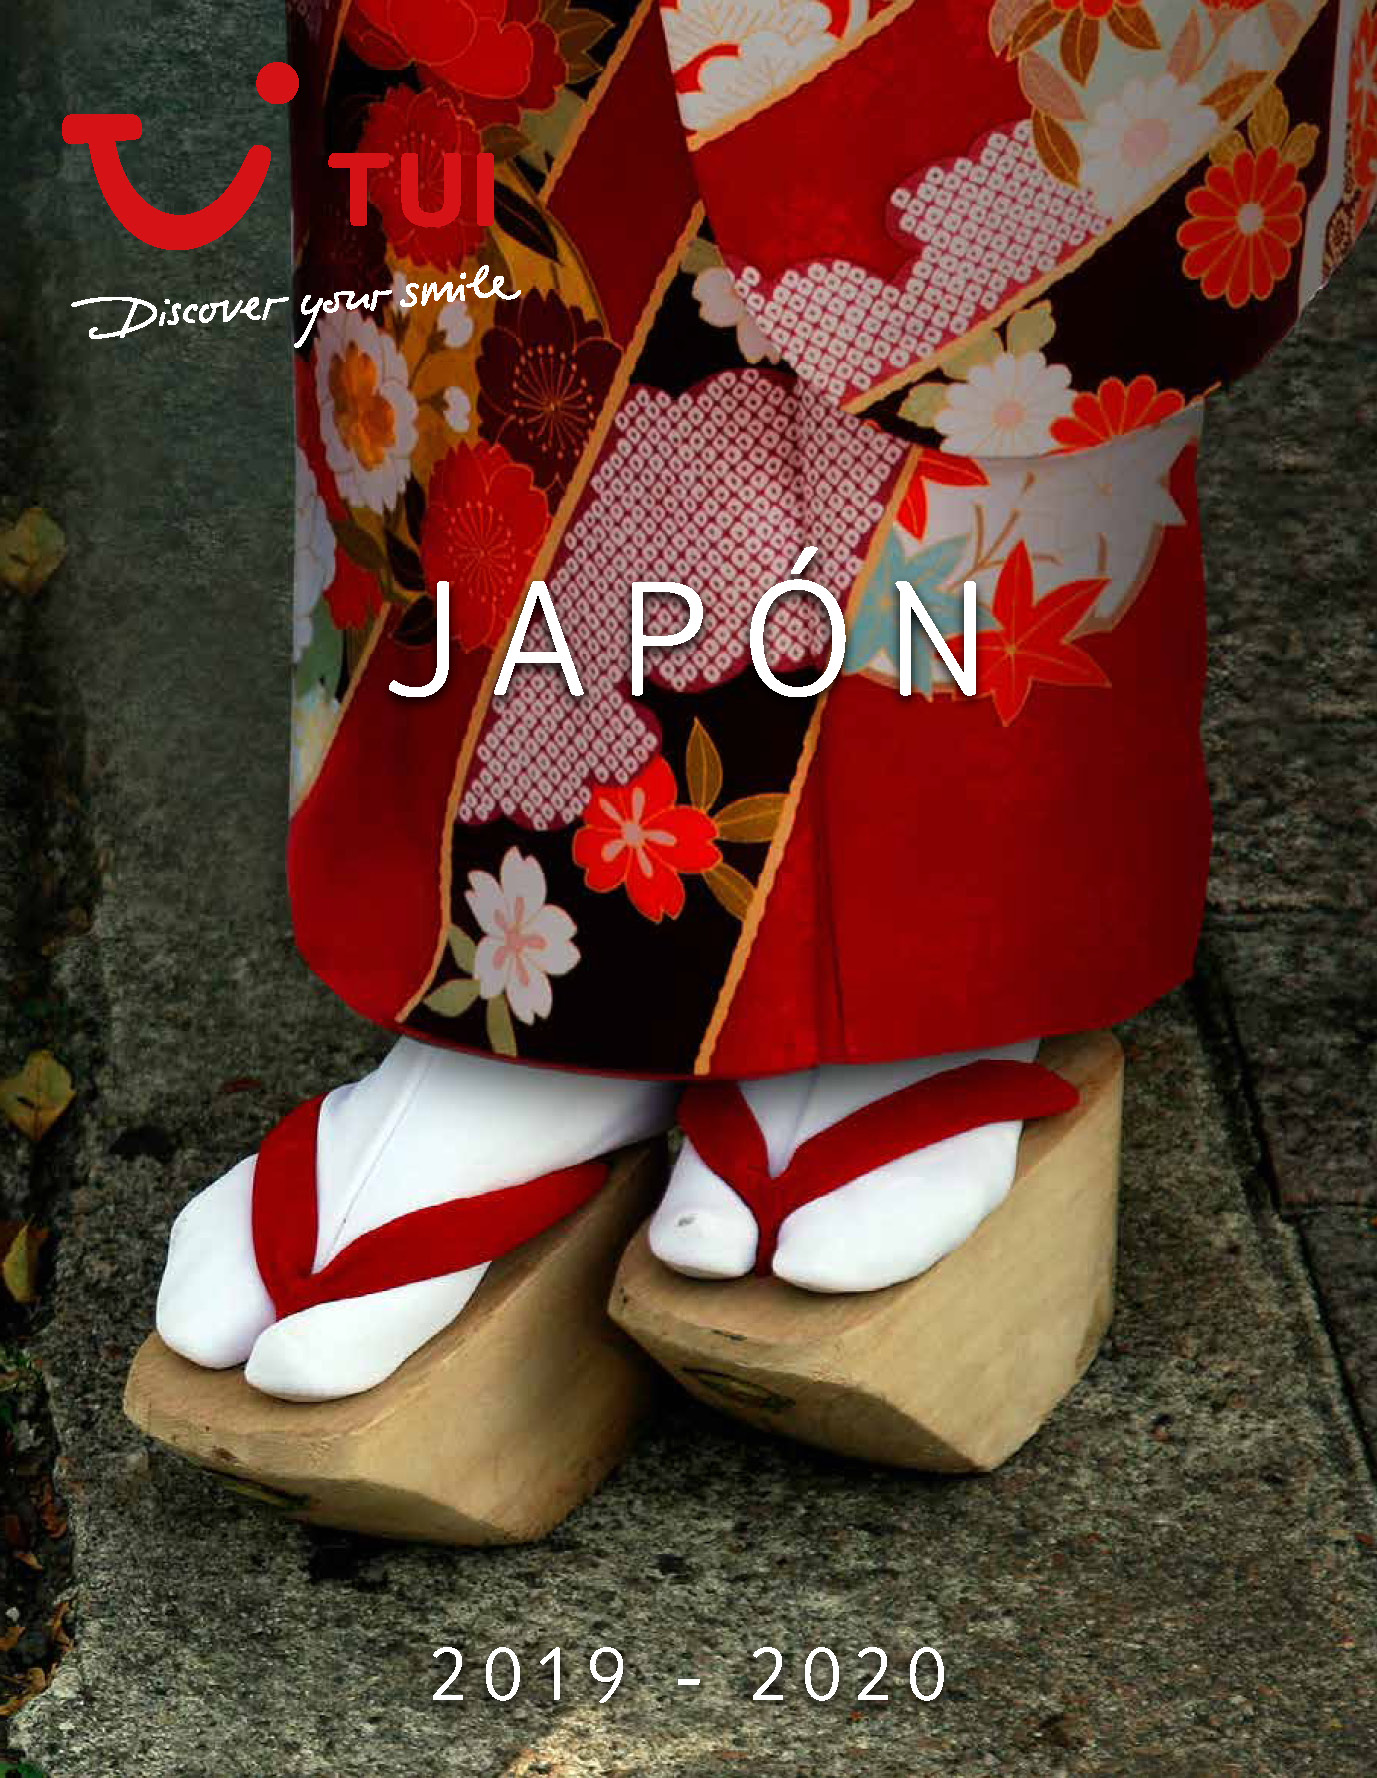 Catalogo TUI Ambassador Tours Japon 2019-2020